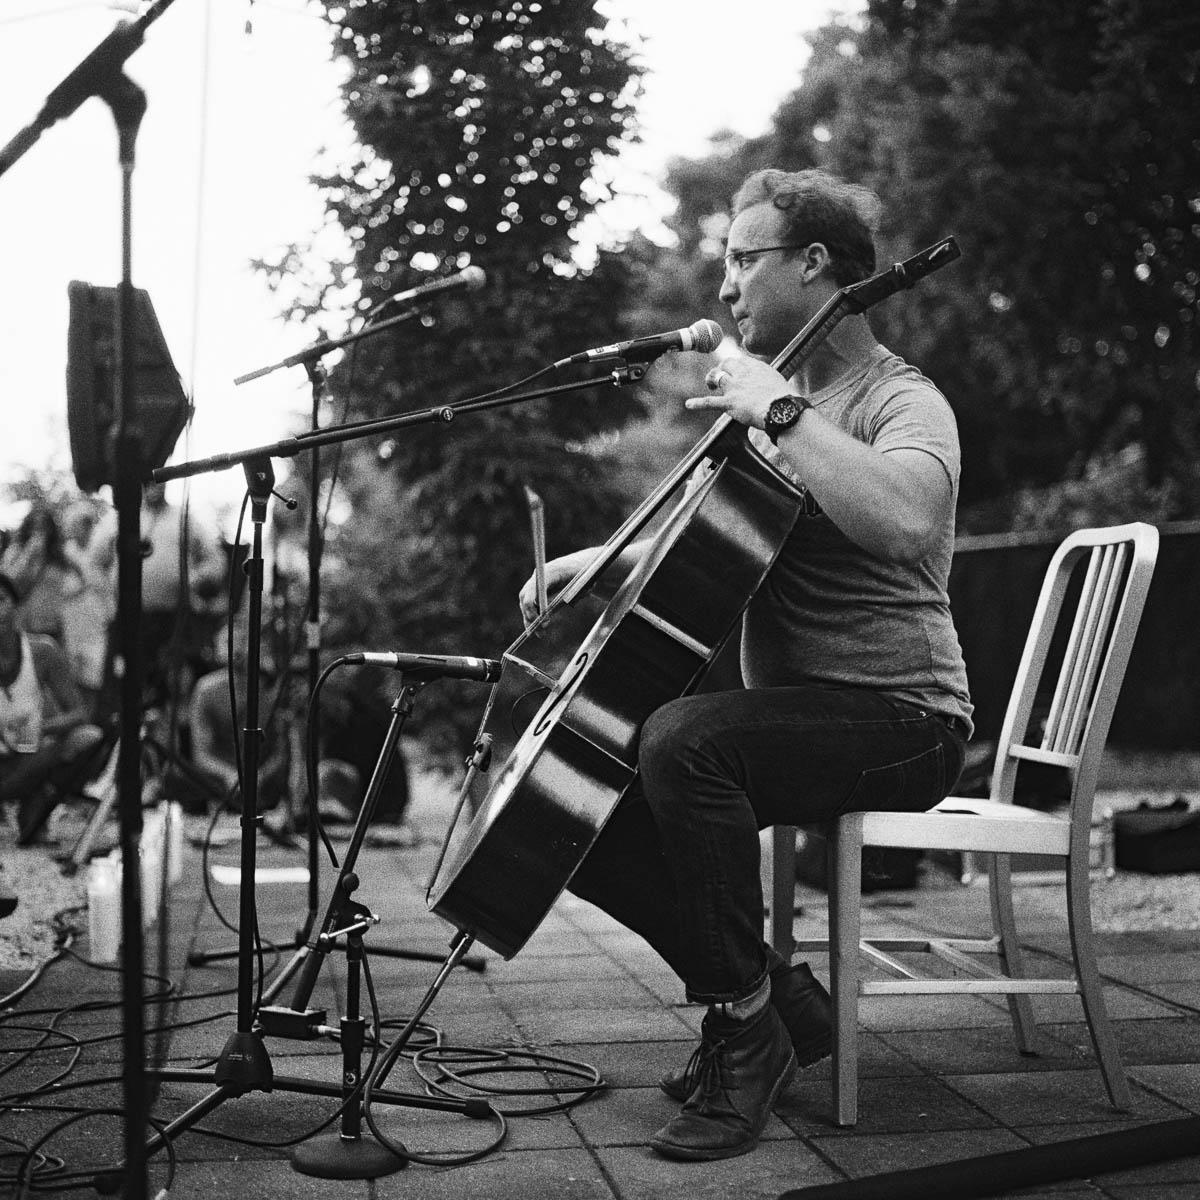 nashville black and white film event photographer documentary ©2015abigailbobophotography0011.jpg